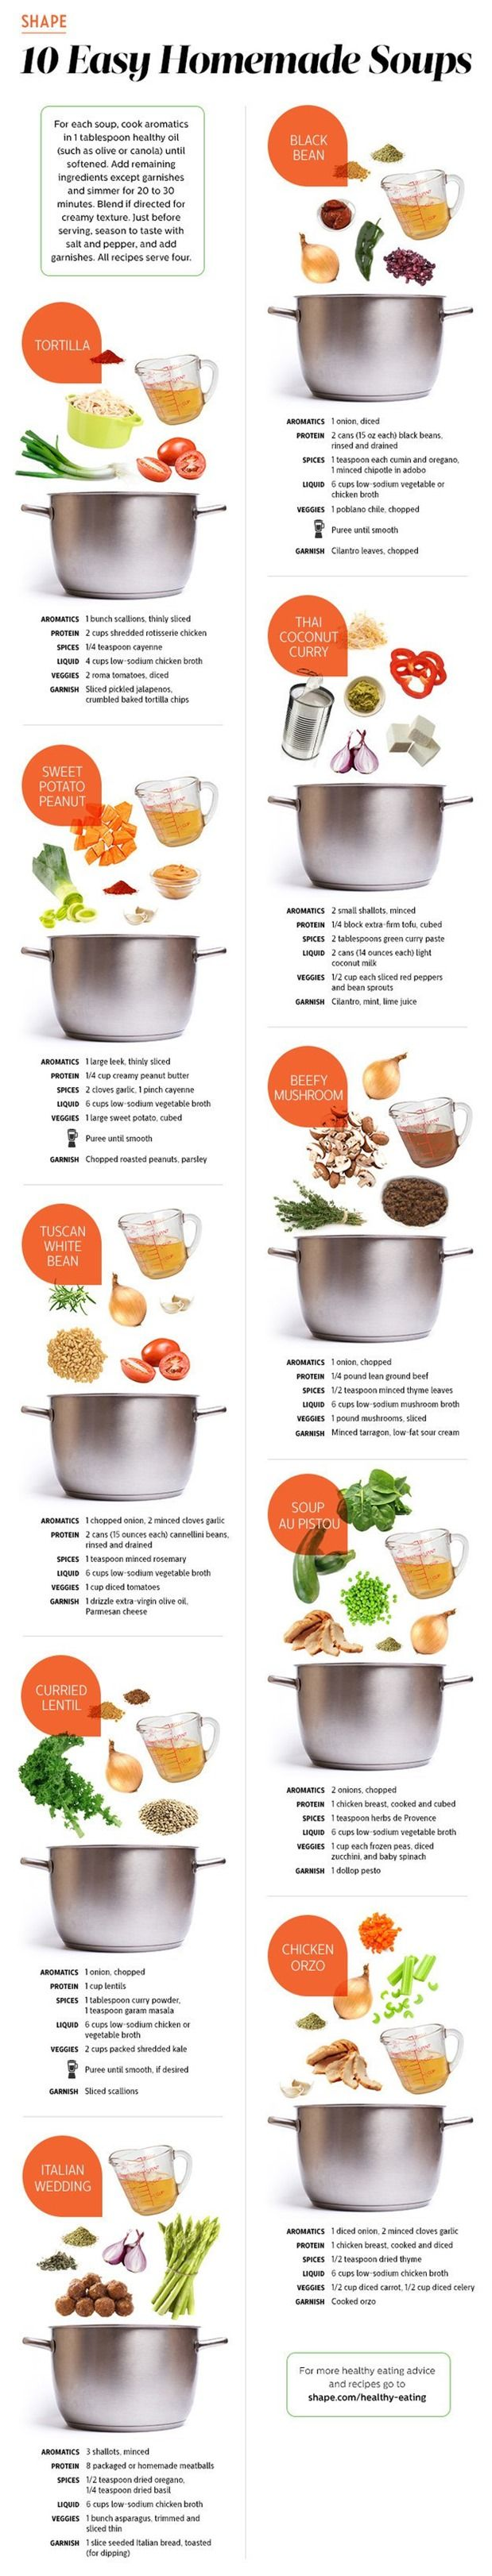 Healthy Homemade Soup Recipes